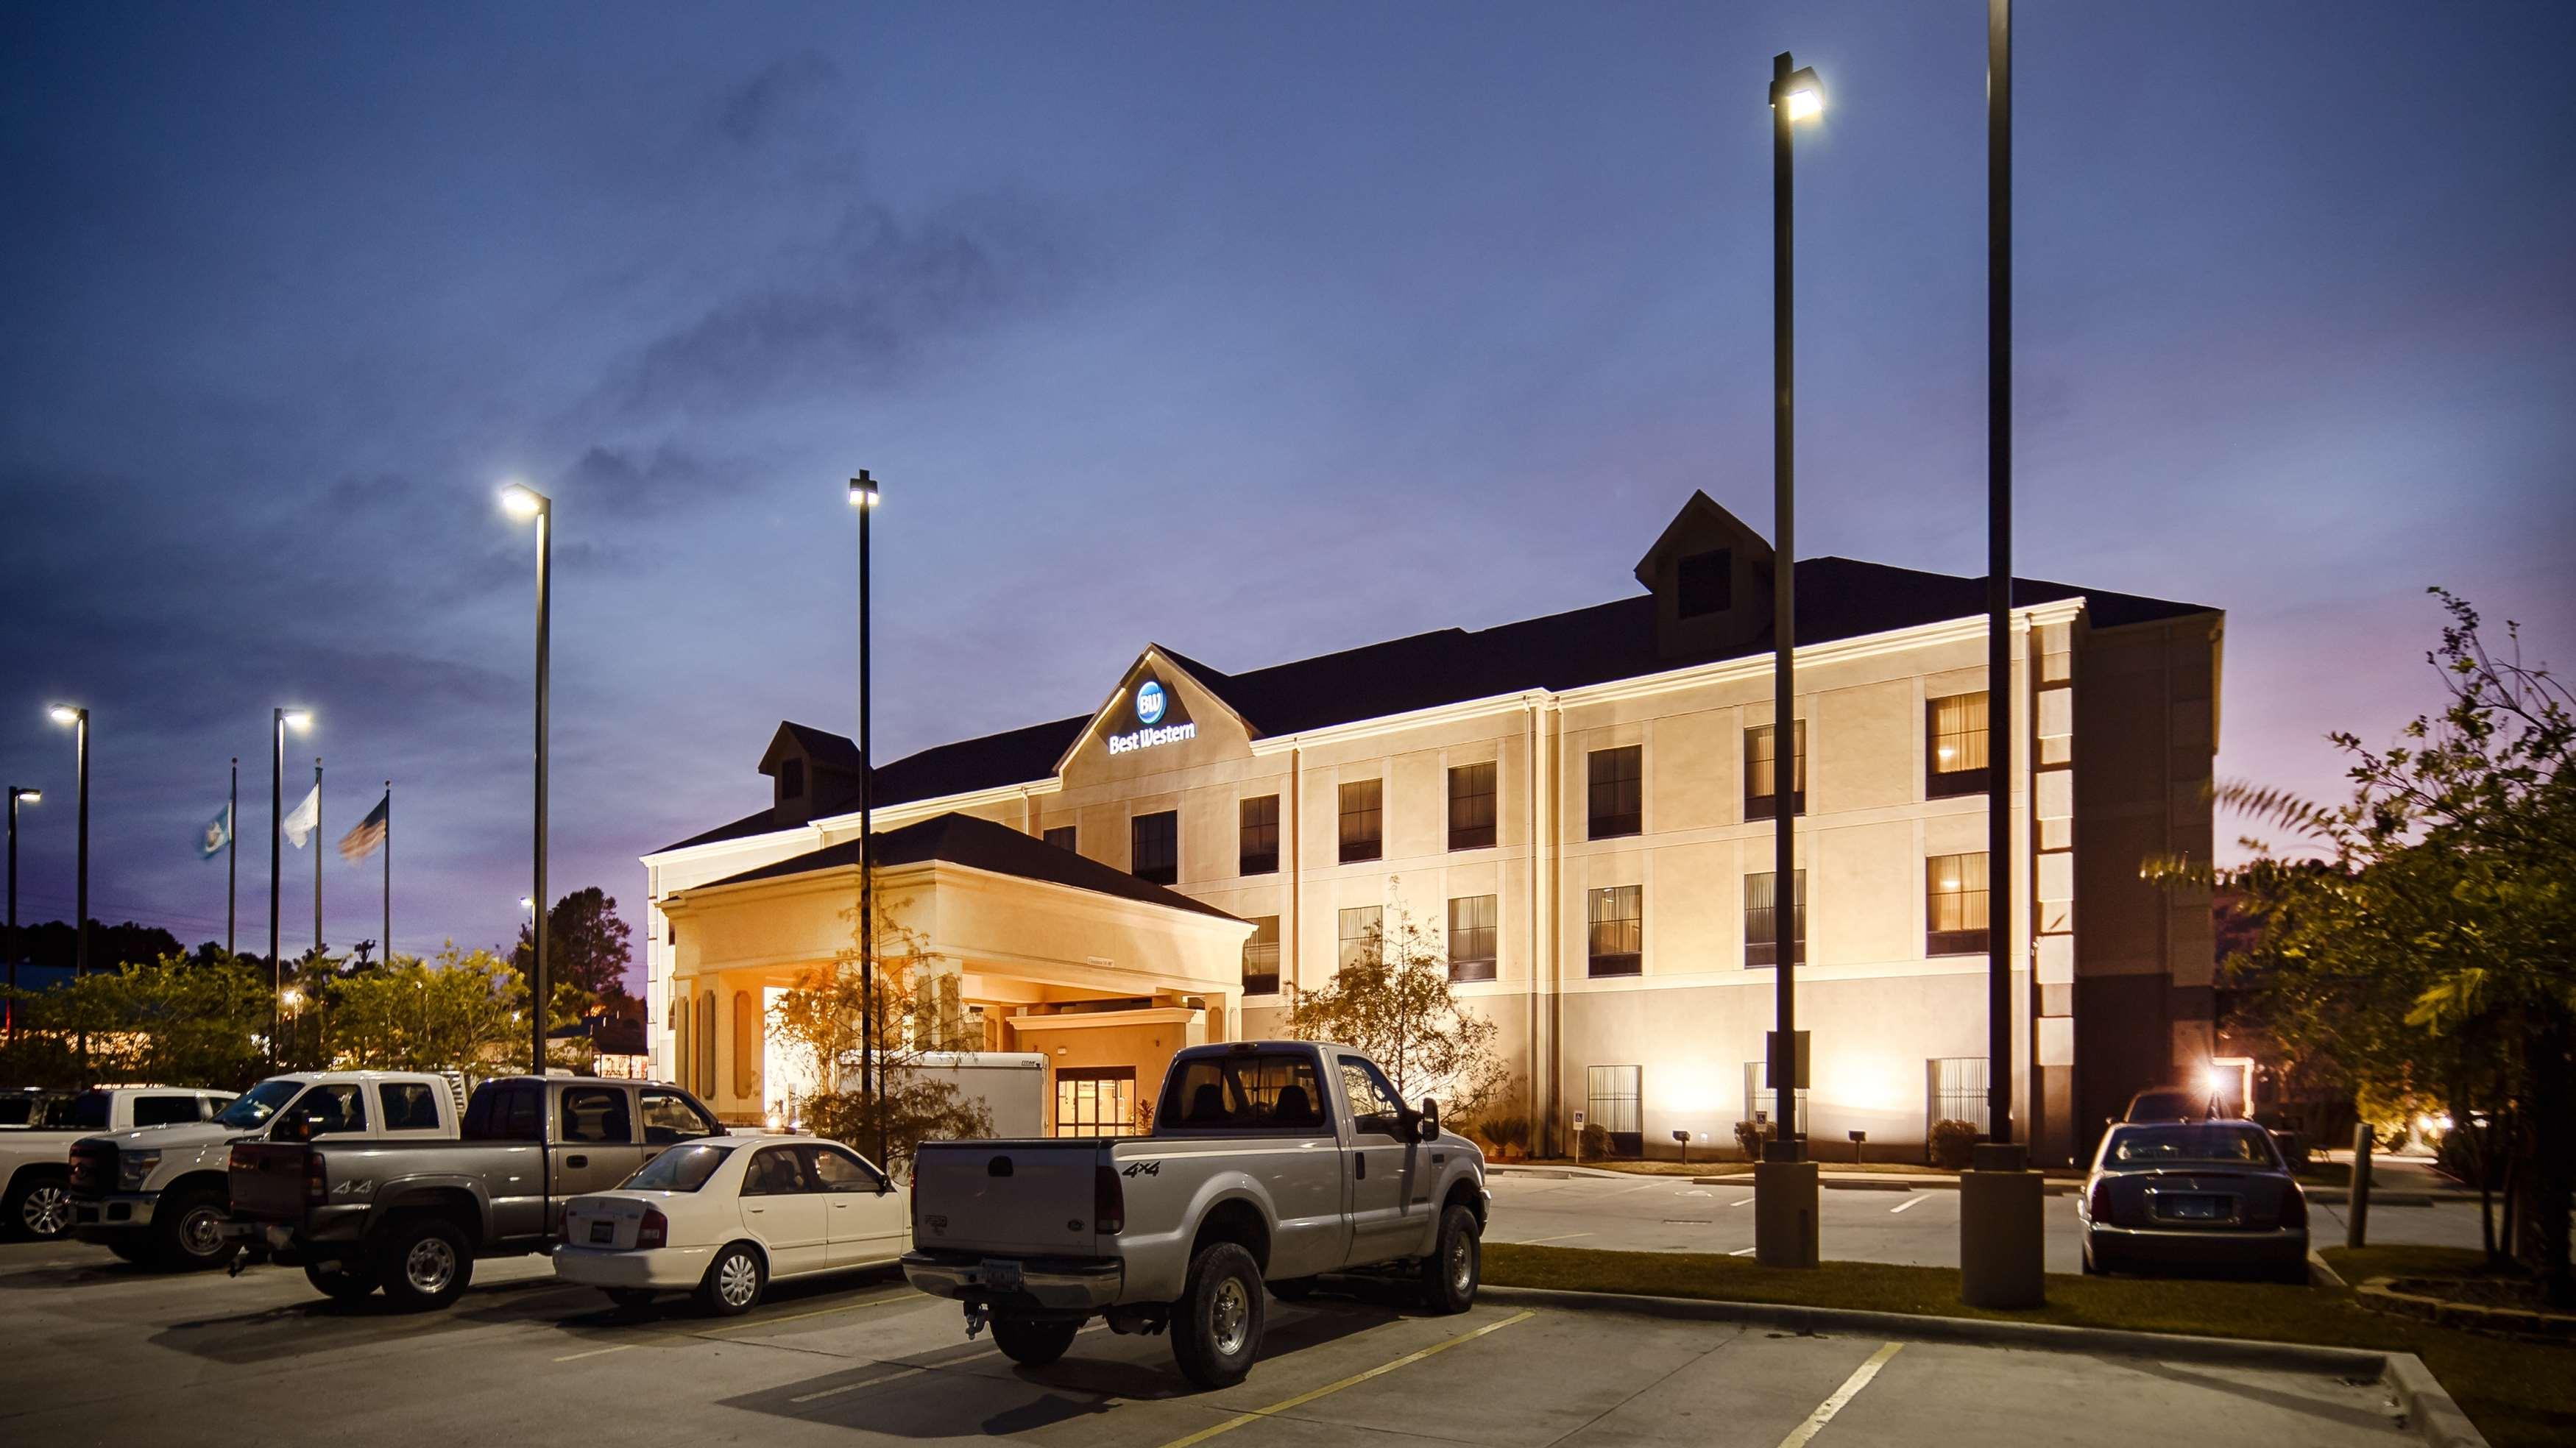 Best Western St. Francisville Hotel image 1